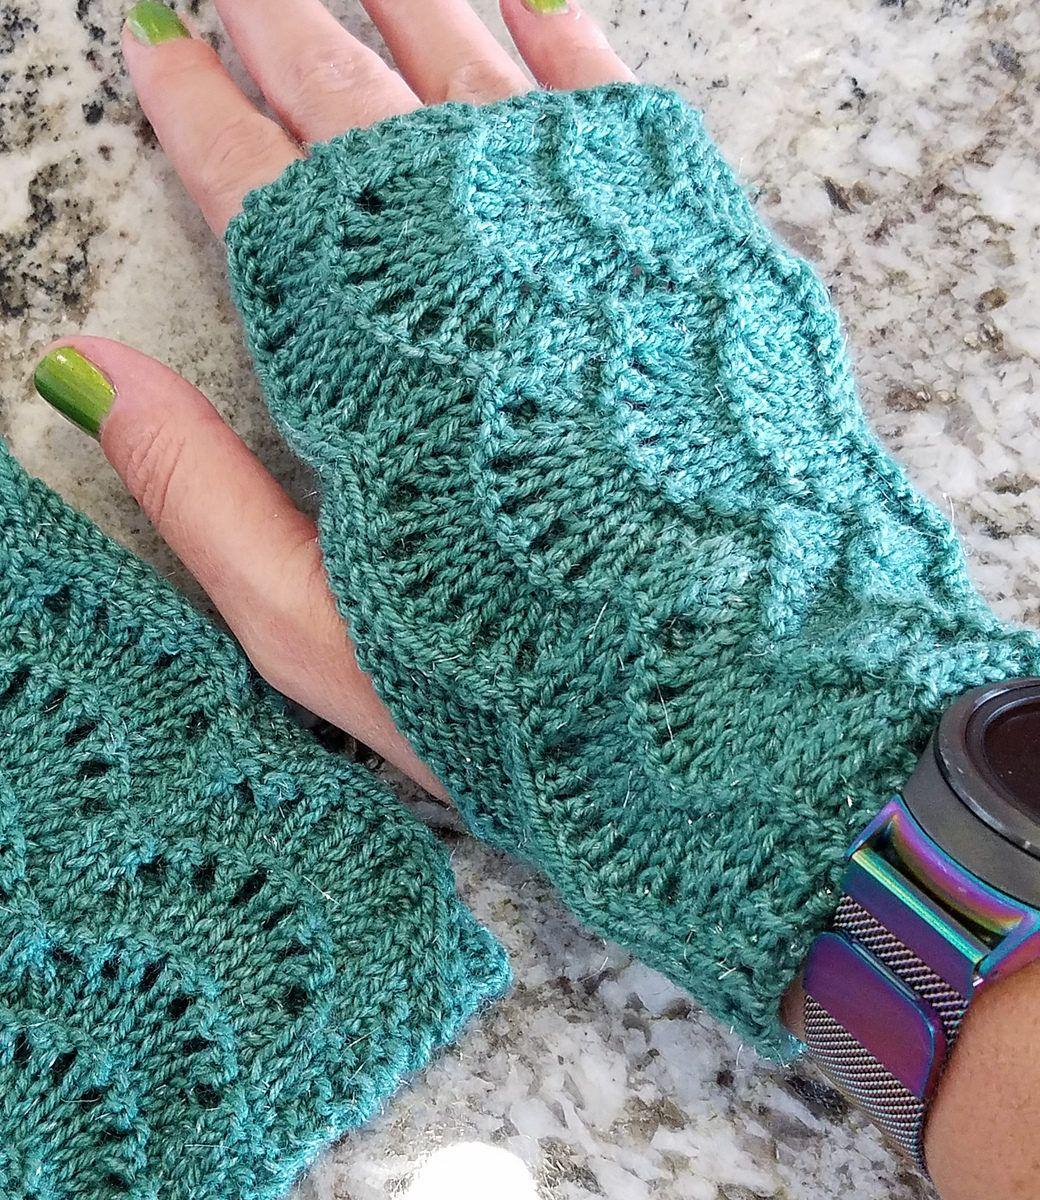 Free knitting pattern for scalloped fingerless gloves crochet free knitting pattern for scalloped fingerless gloves bankloansurffo Image collections